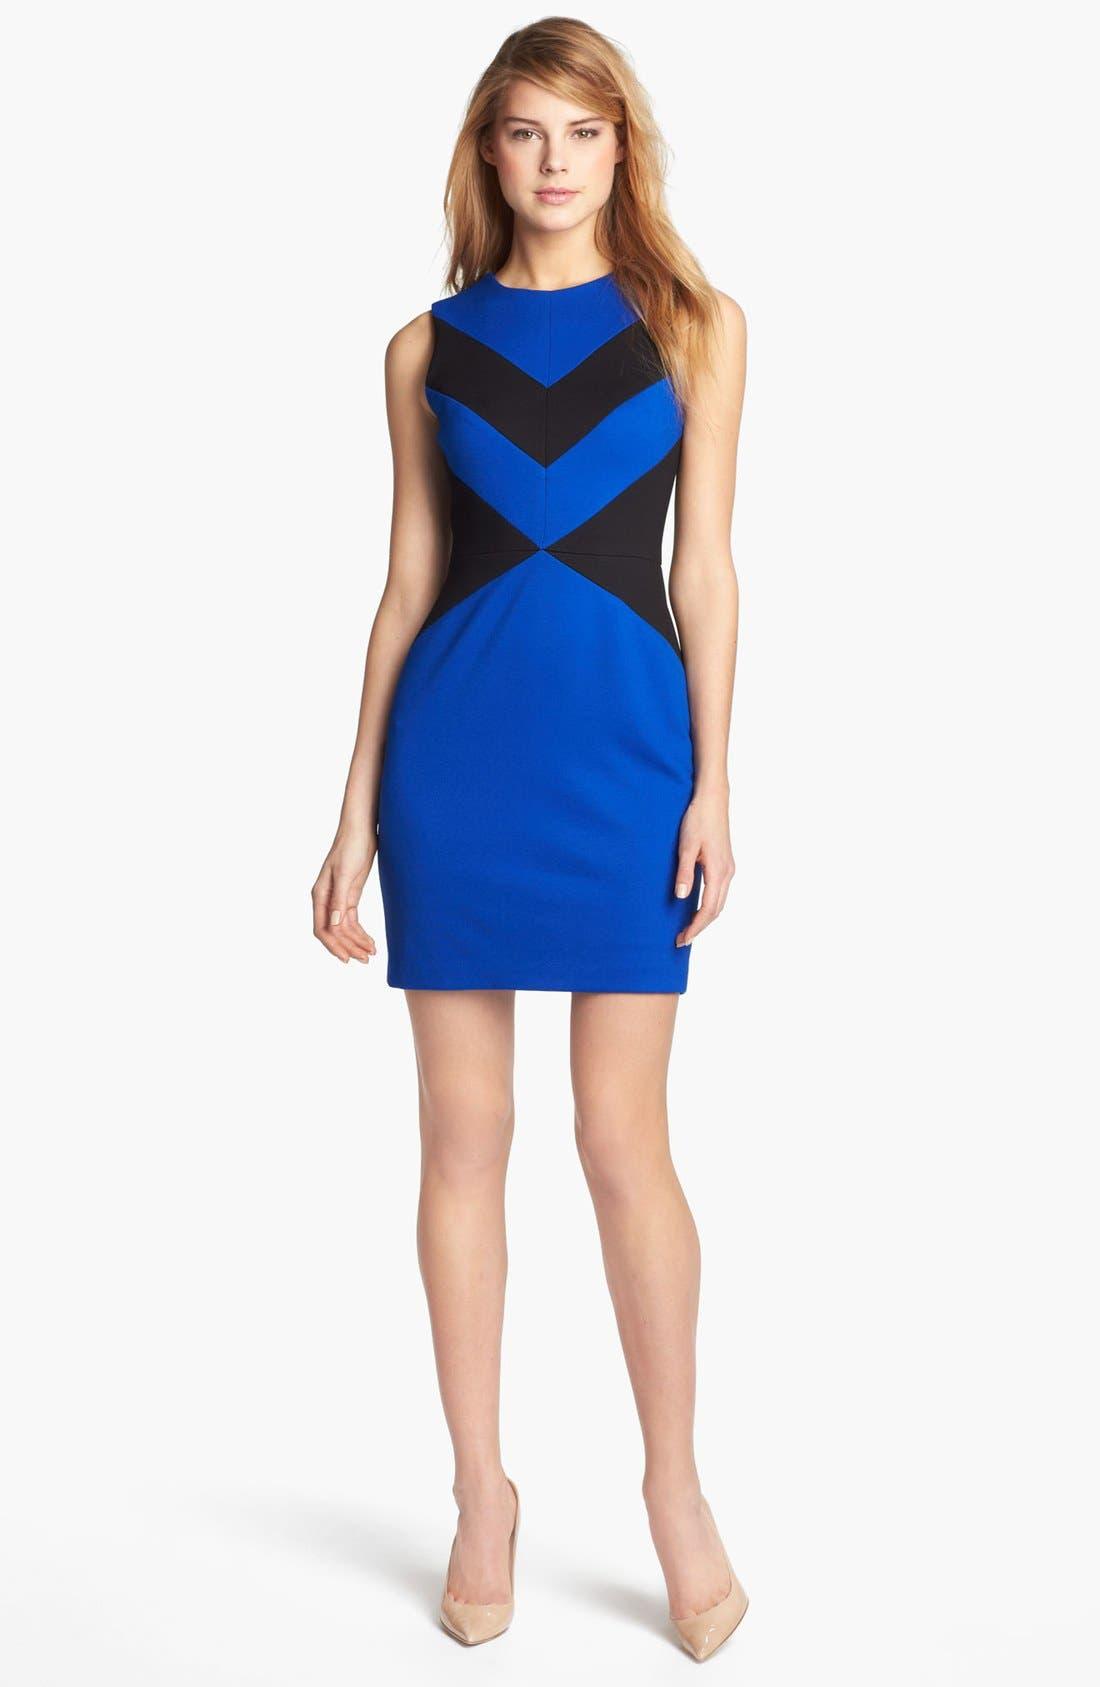 Main Image - Cynthia Steffe 'Elizabeth' Sleeveless Colorblock Sheath Dress